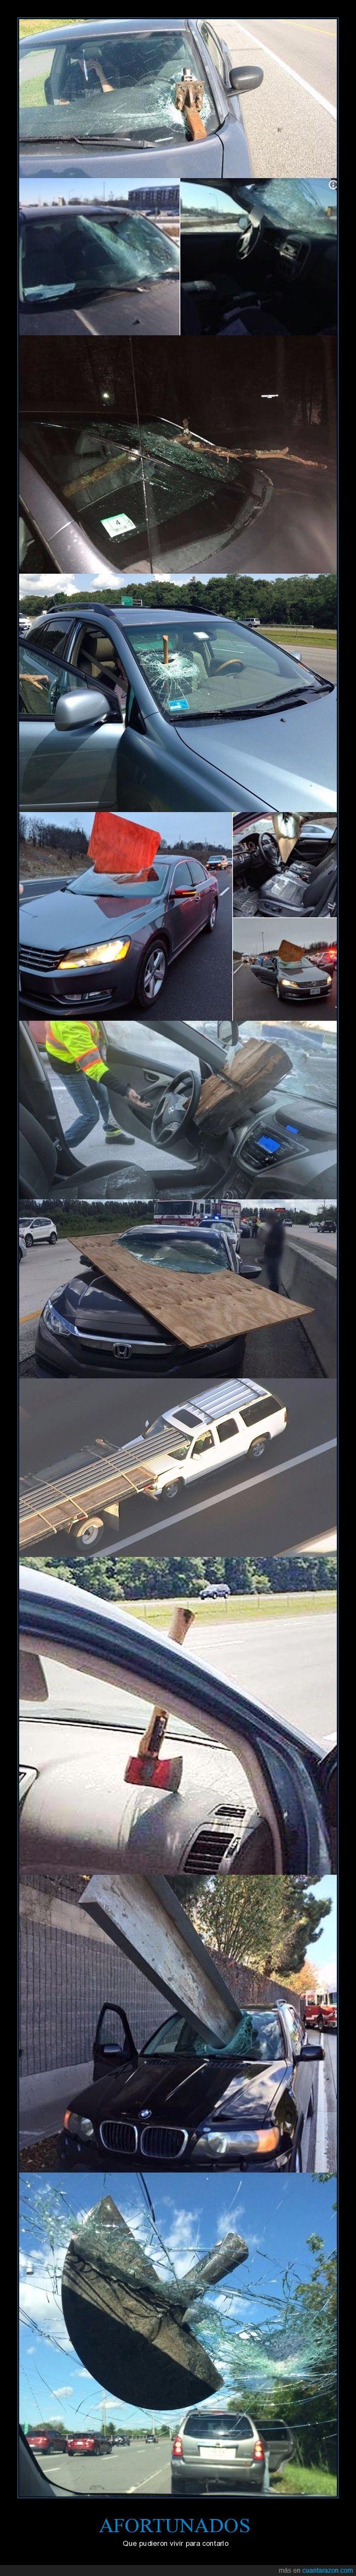 accidentes,afortunados,coches,fails